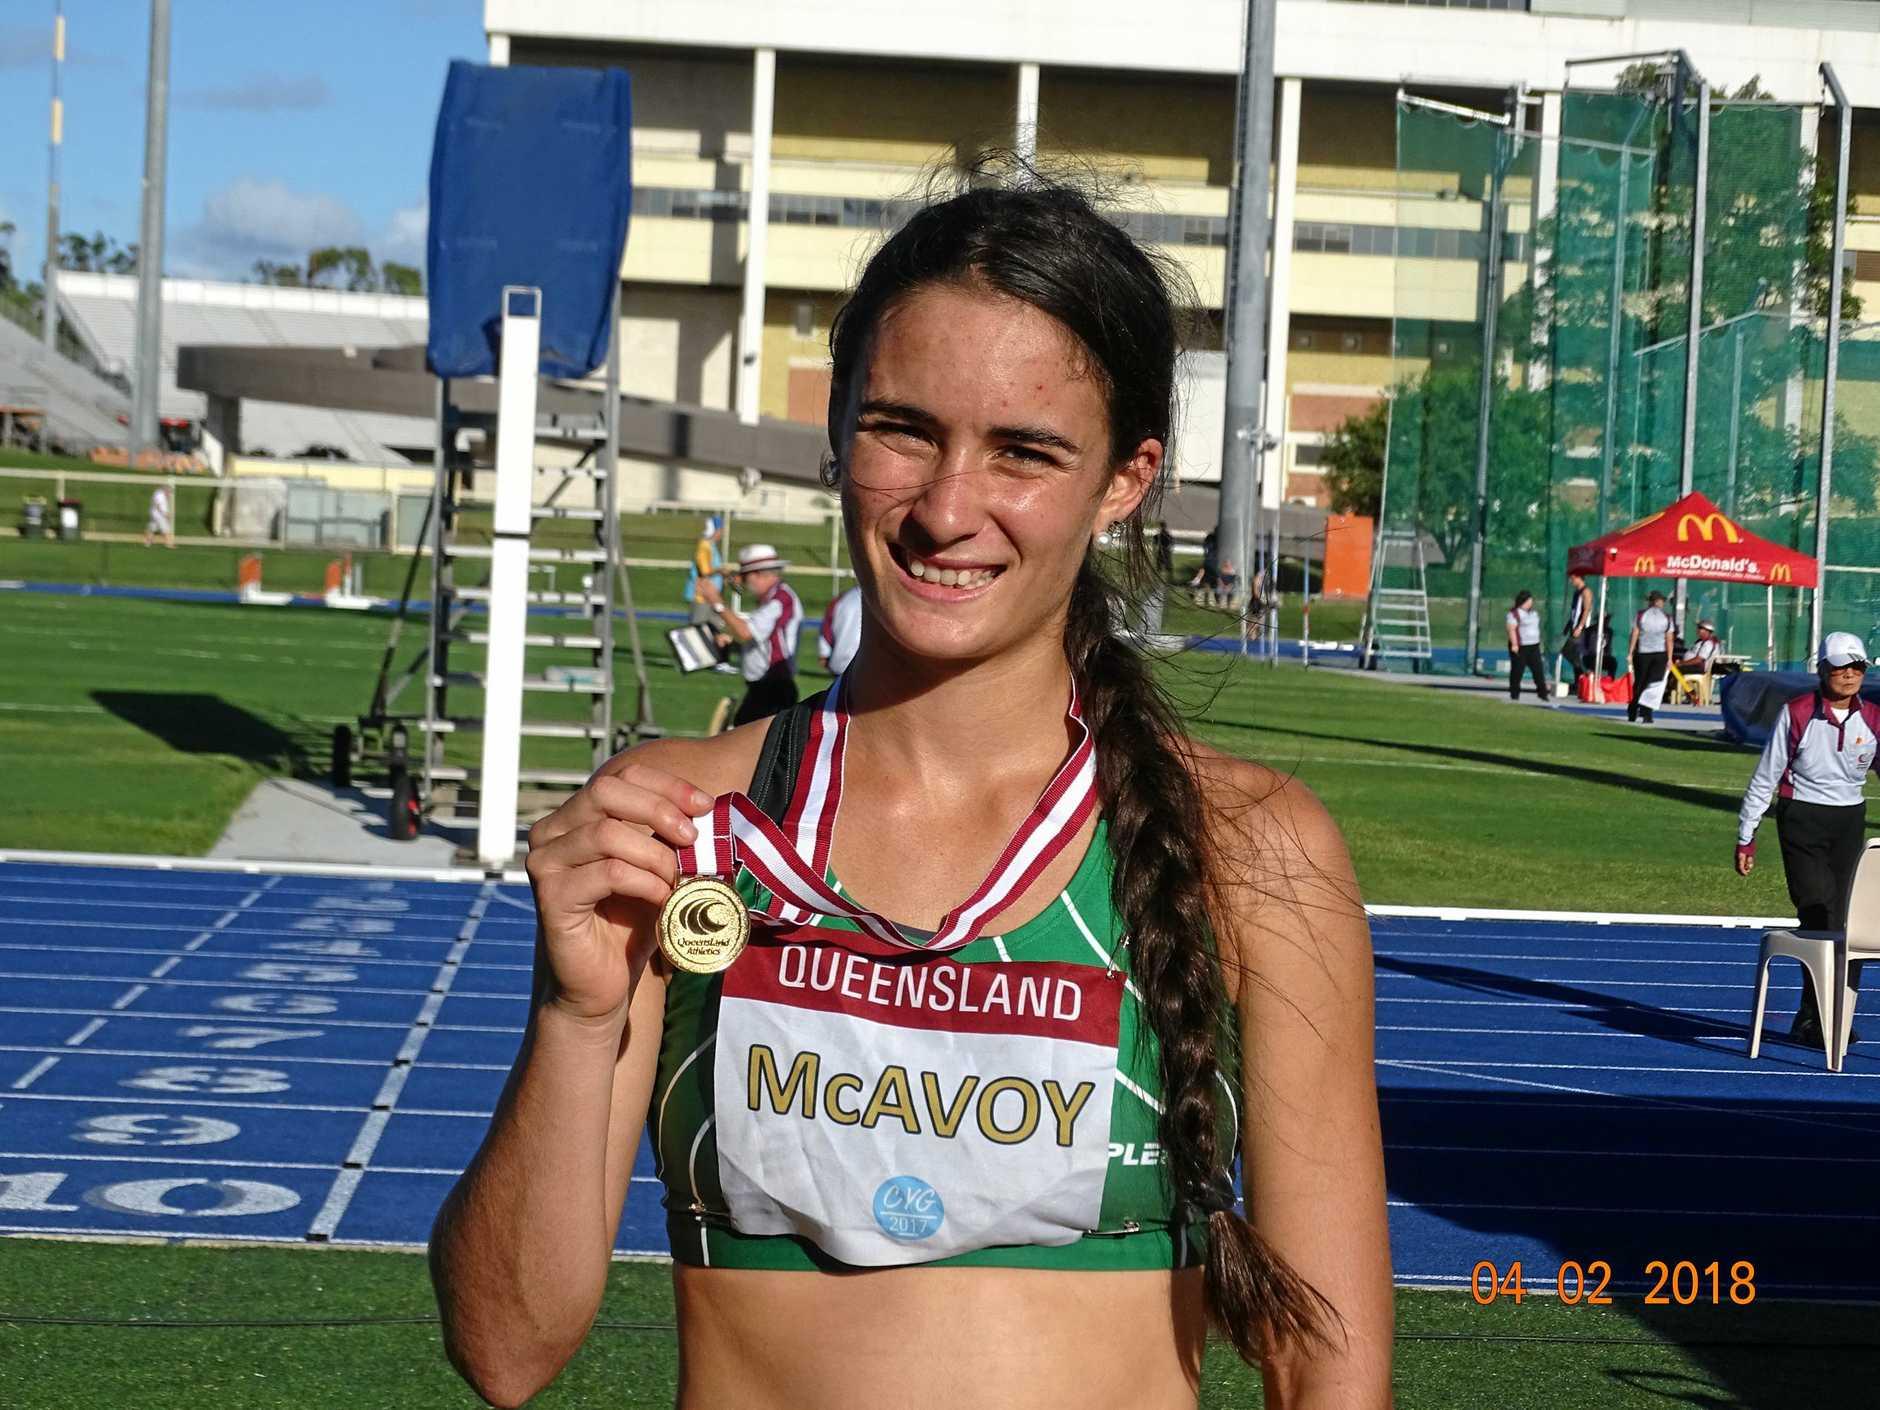 Ipswich and District Athletic Club runner Montanna McAvoy.